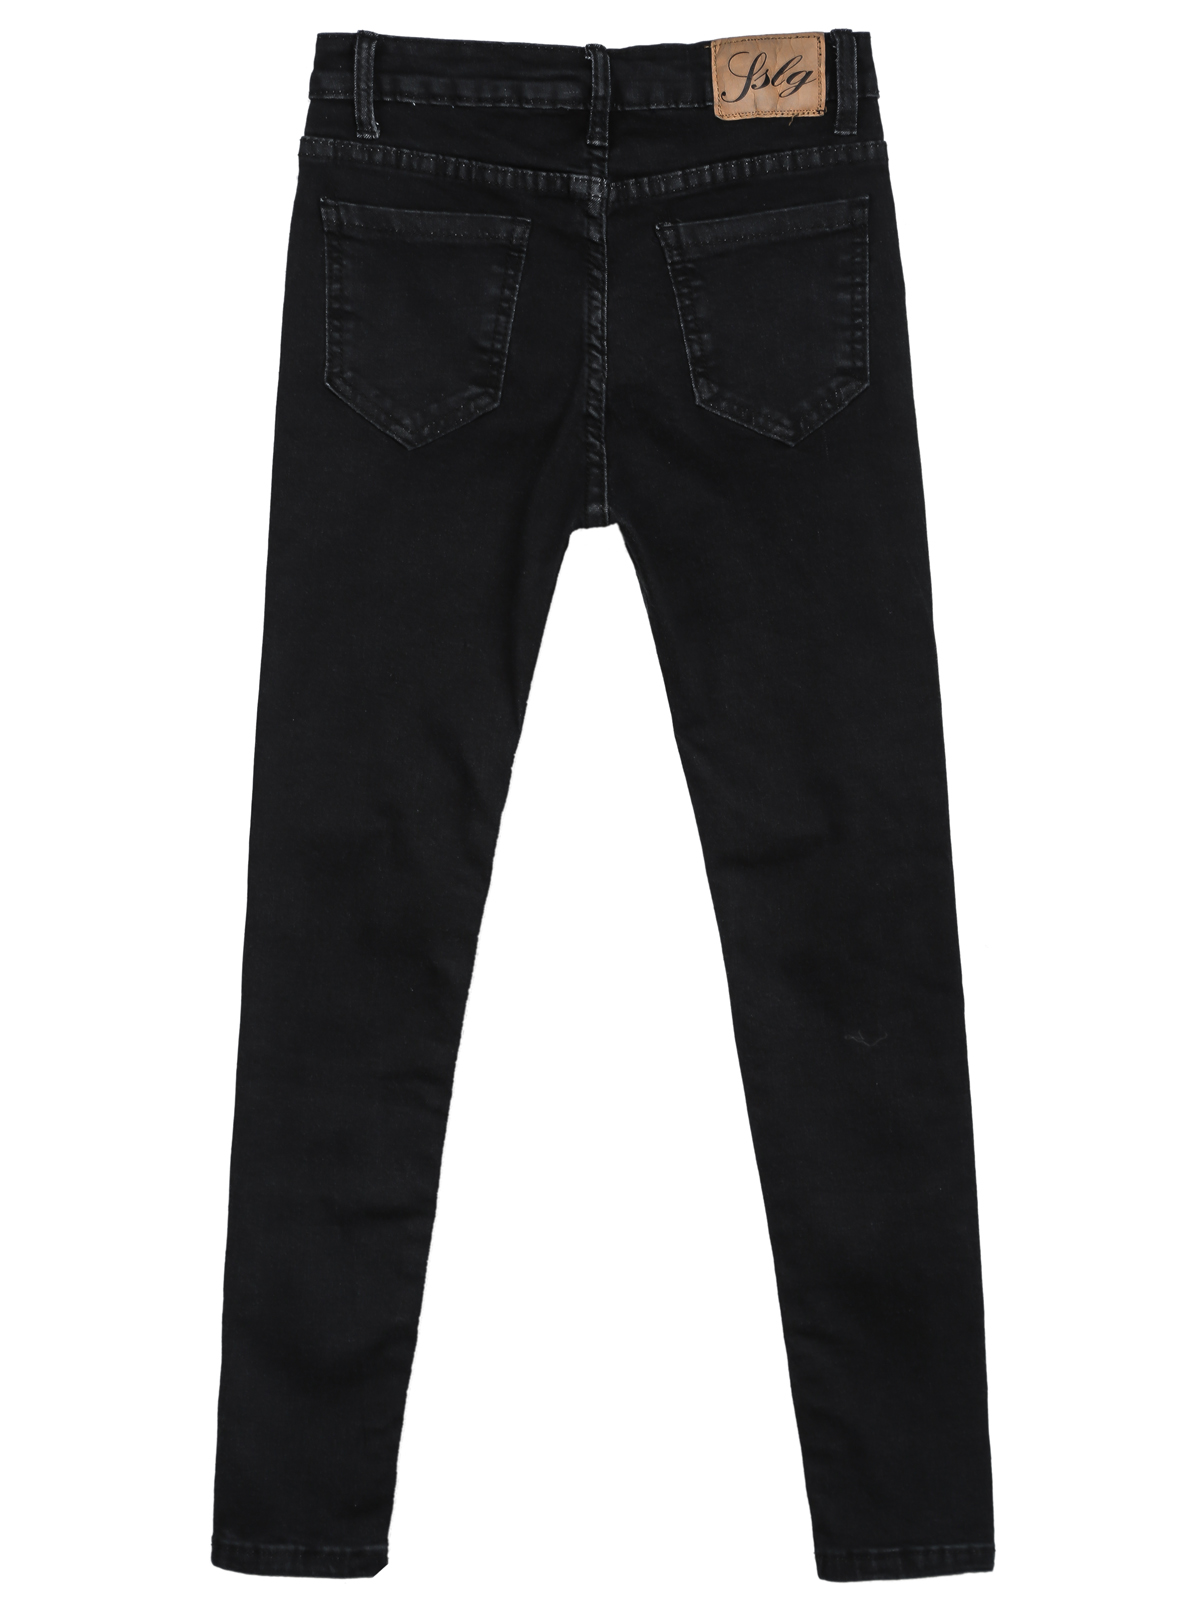 Black Slim Ripped Pockets Denim Pant - Sheinside.com